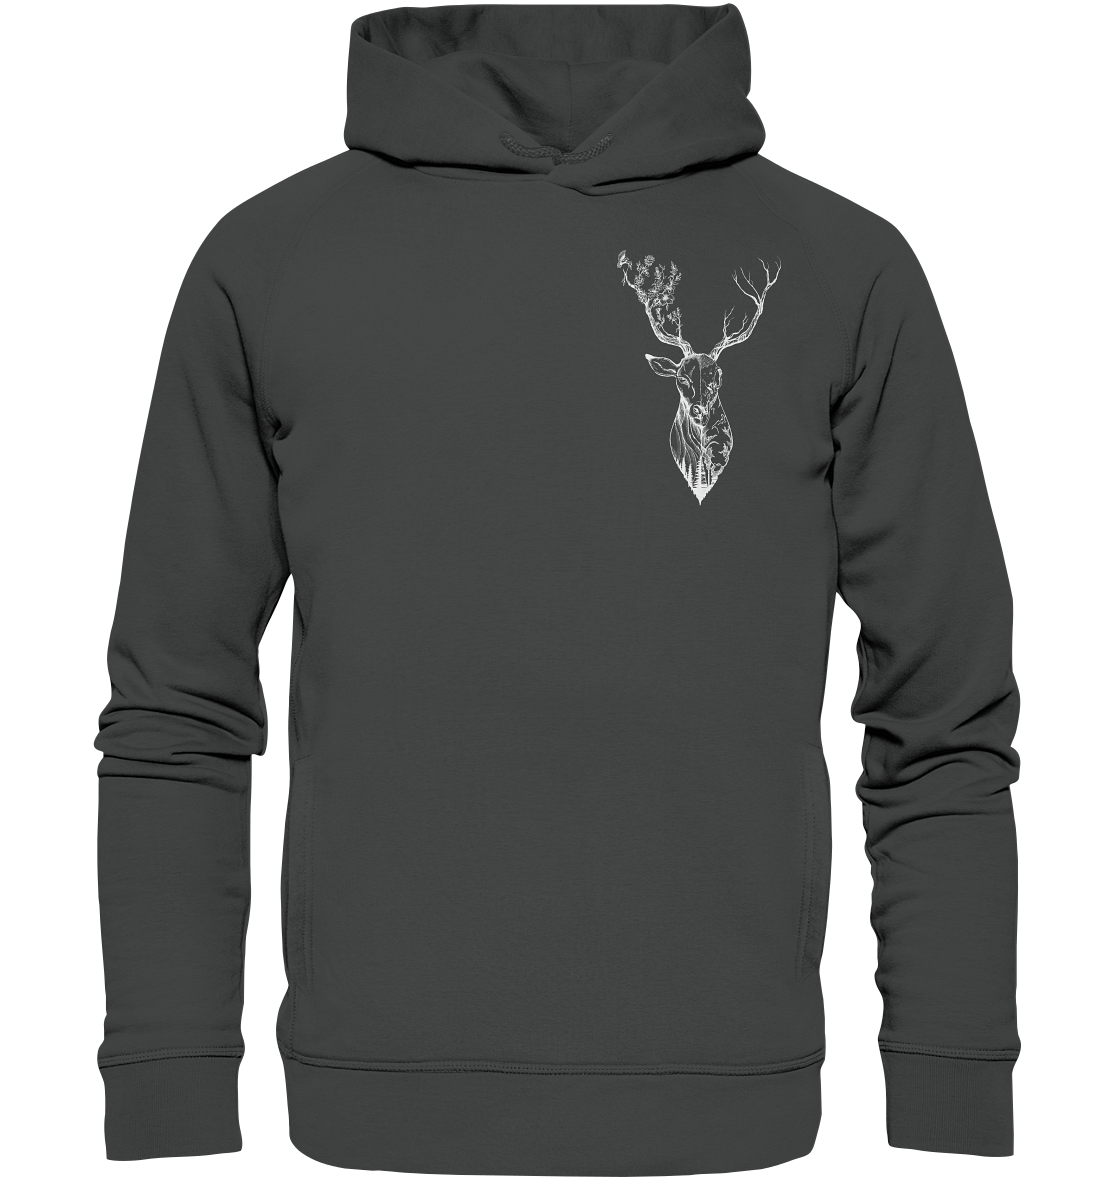 front-organic-fashion-hoodie-444545-1116x-6.png